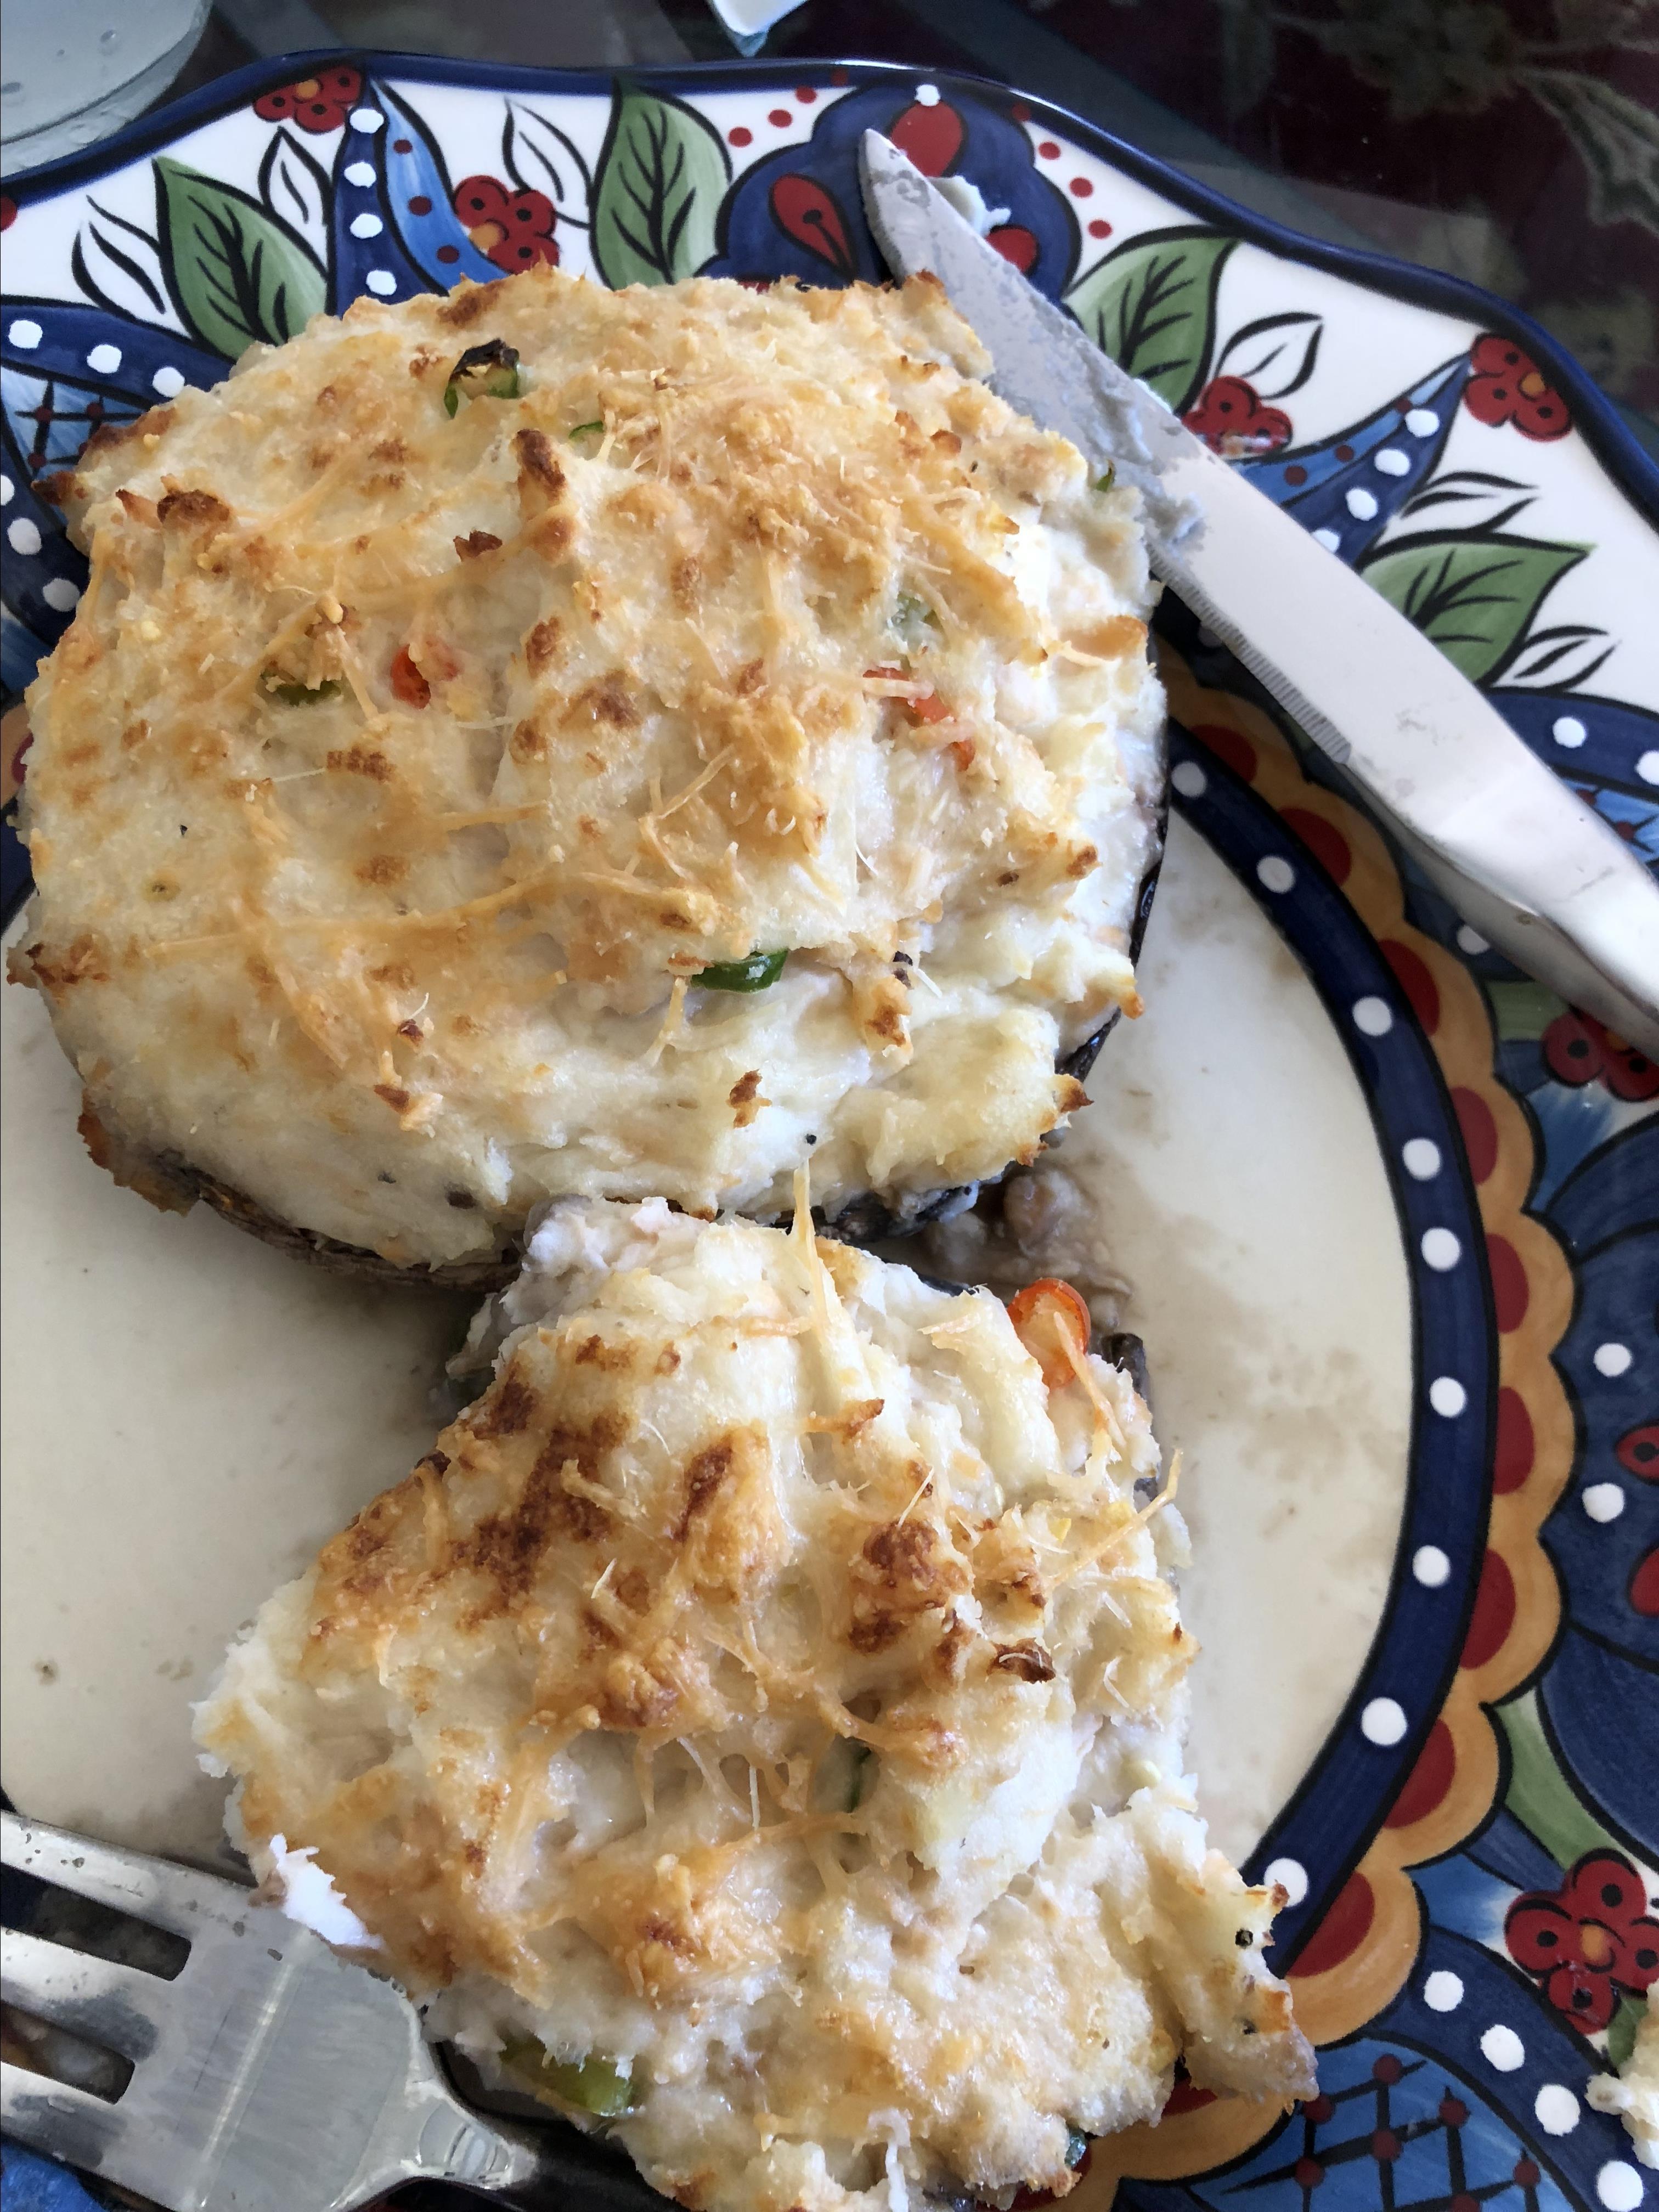 Four Cheese Mashed Potato Stuffed Portobello Mushrooms